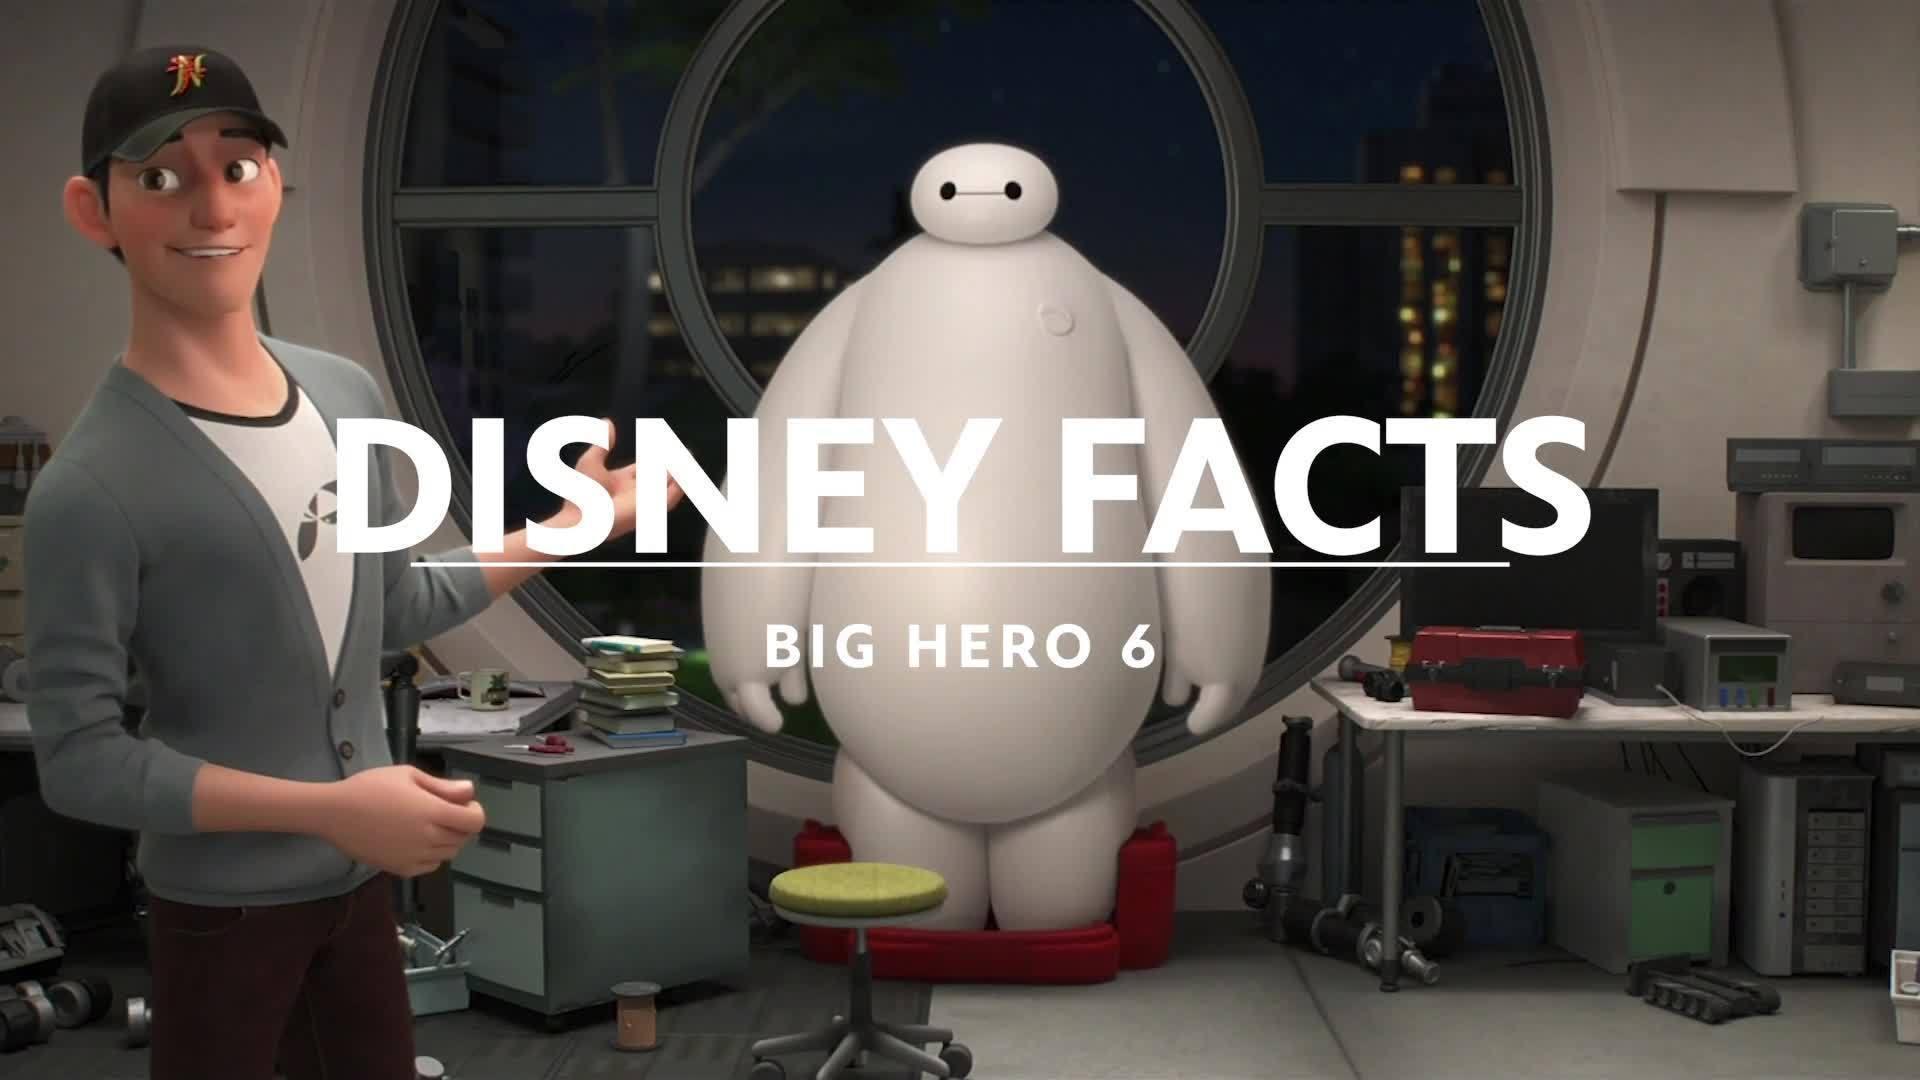 Big Hero 6 Secrets & Easter Eggs | Disney Facts by Disney